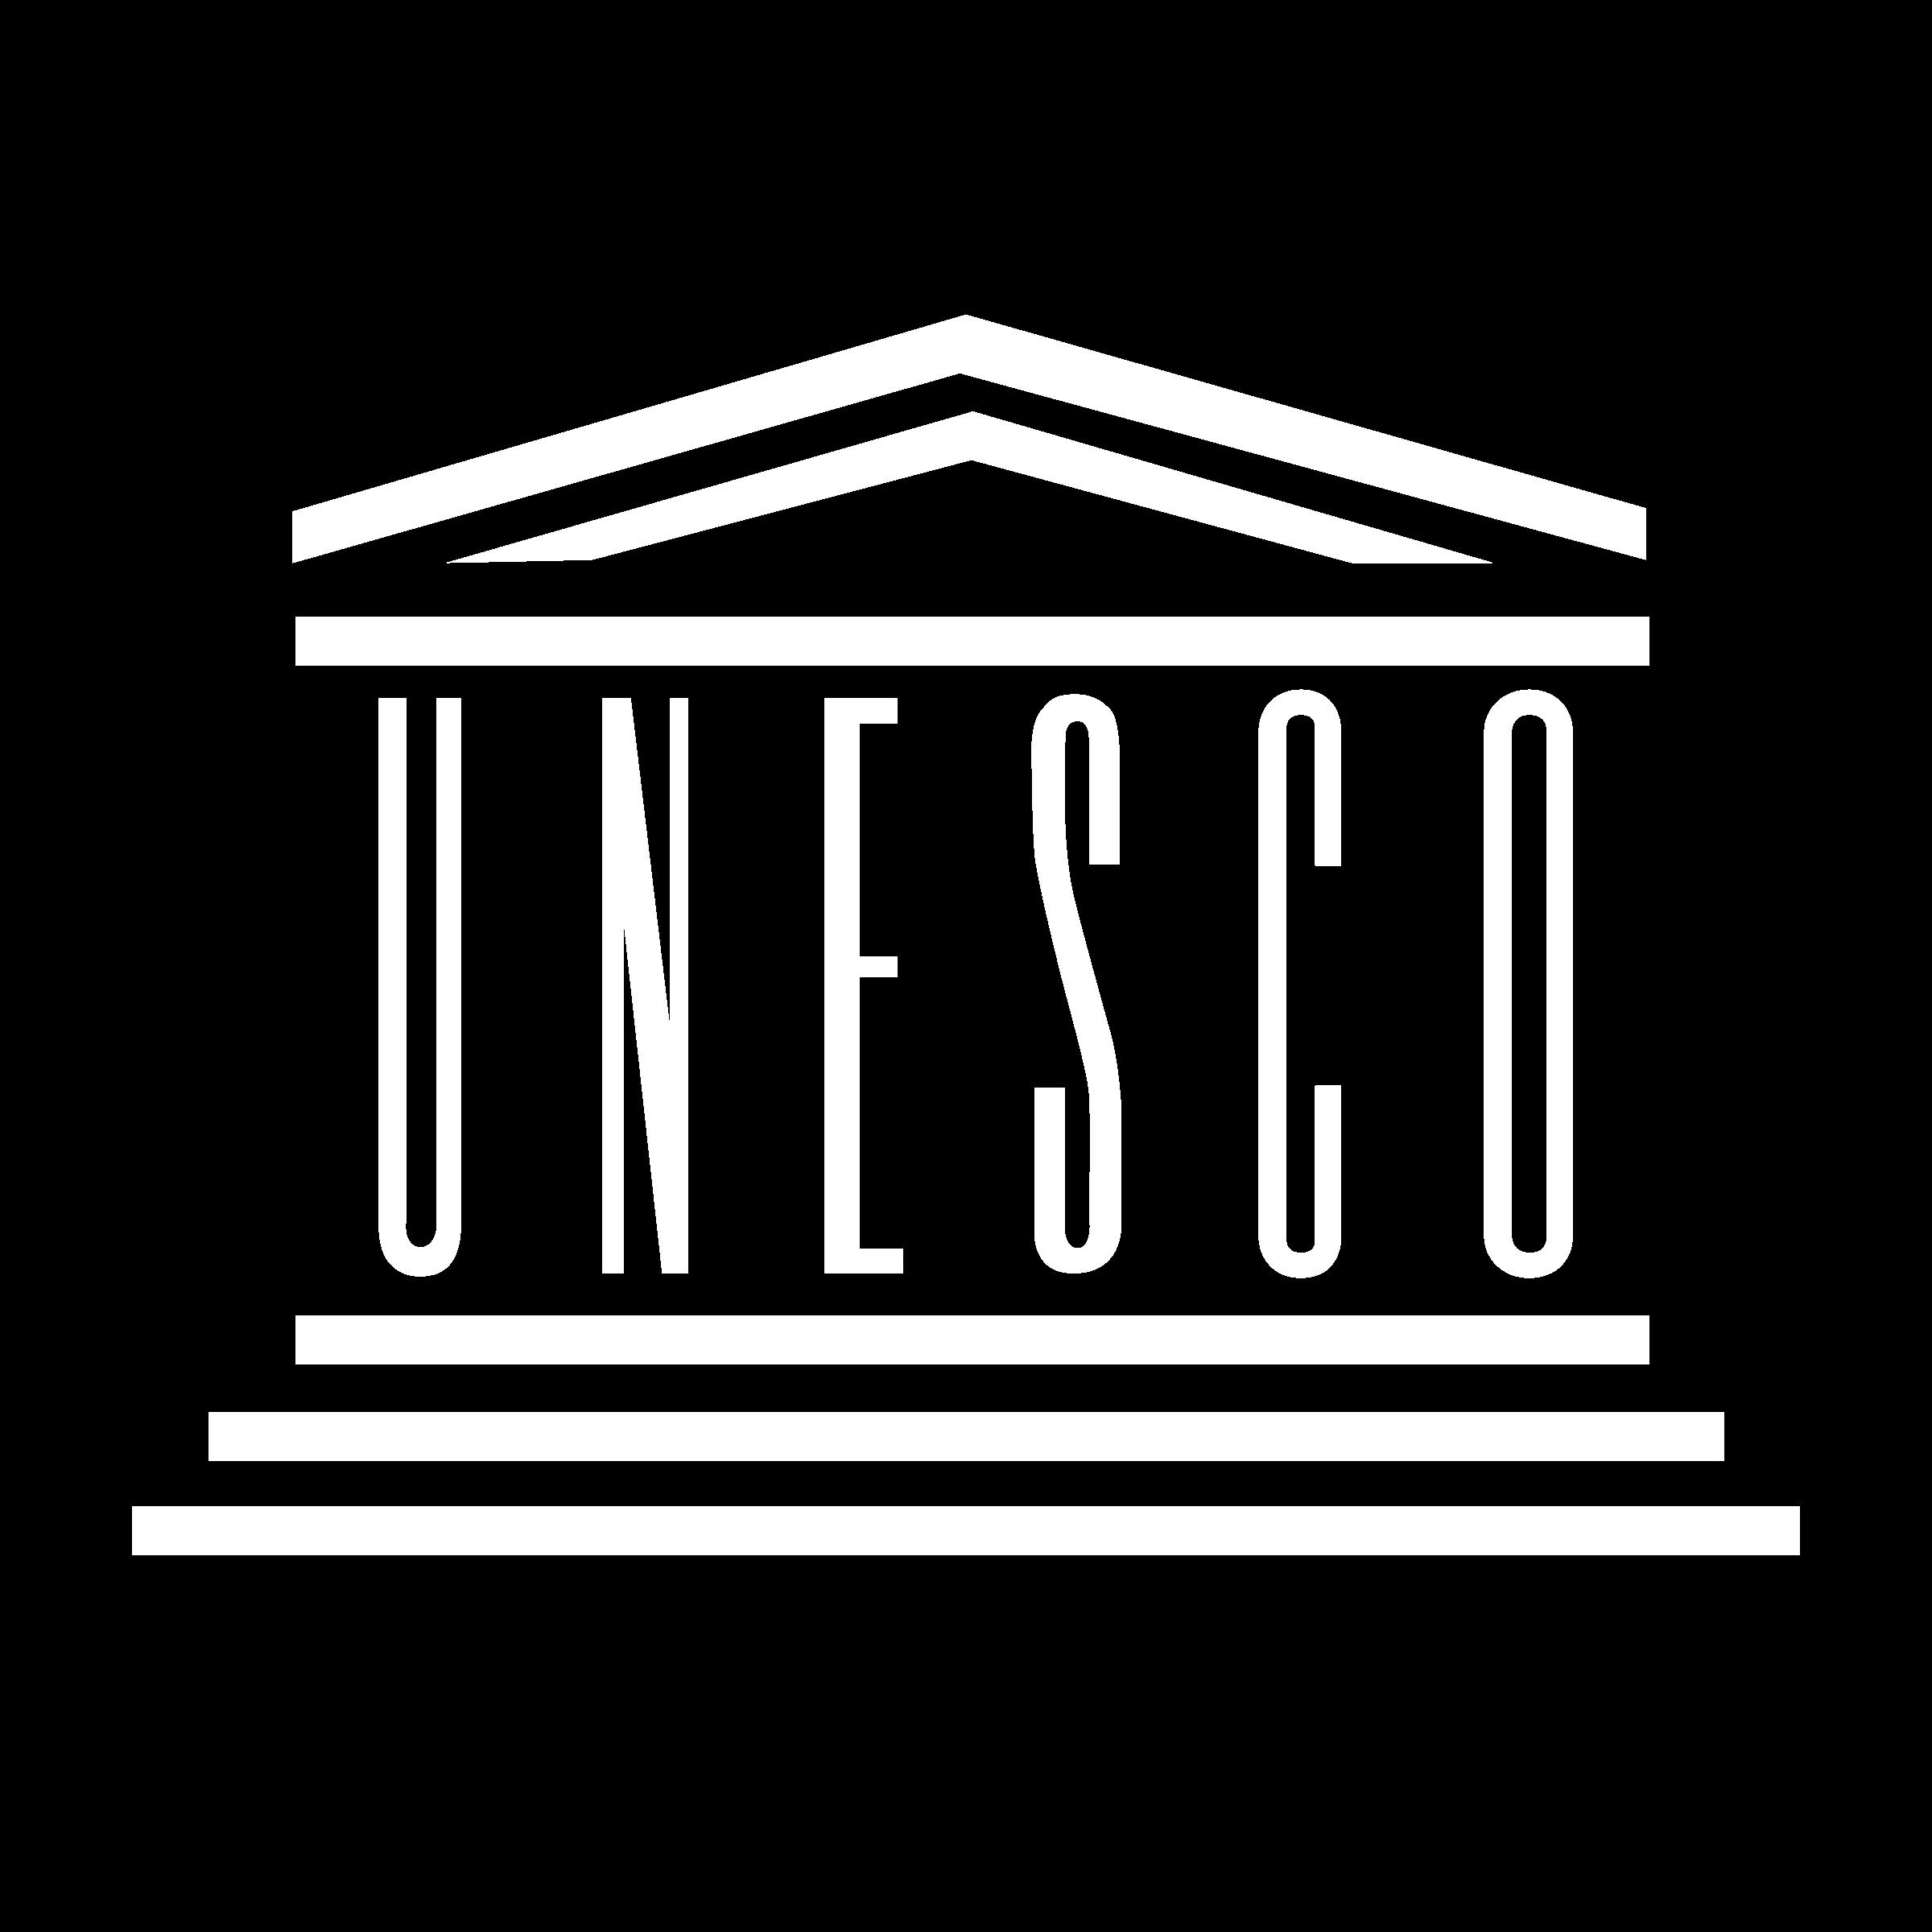 Unesco logo black and white